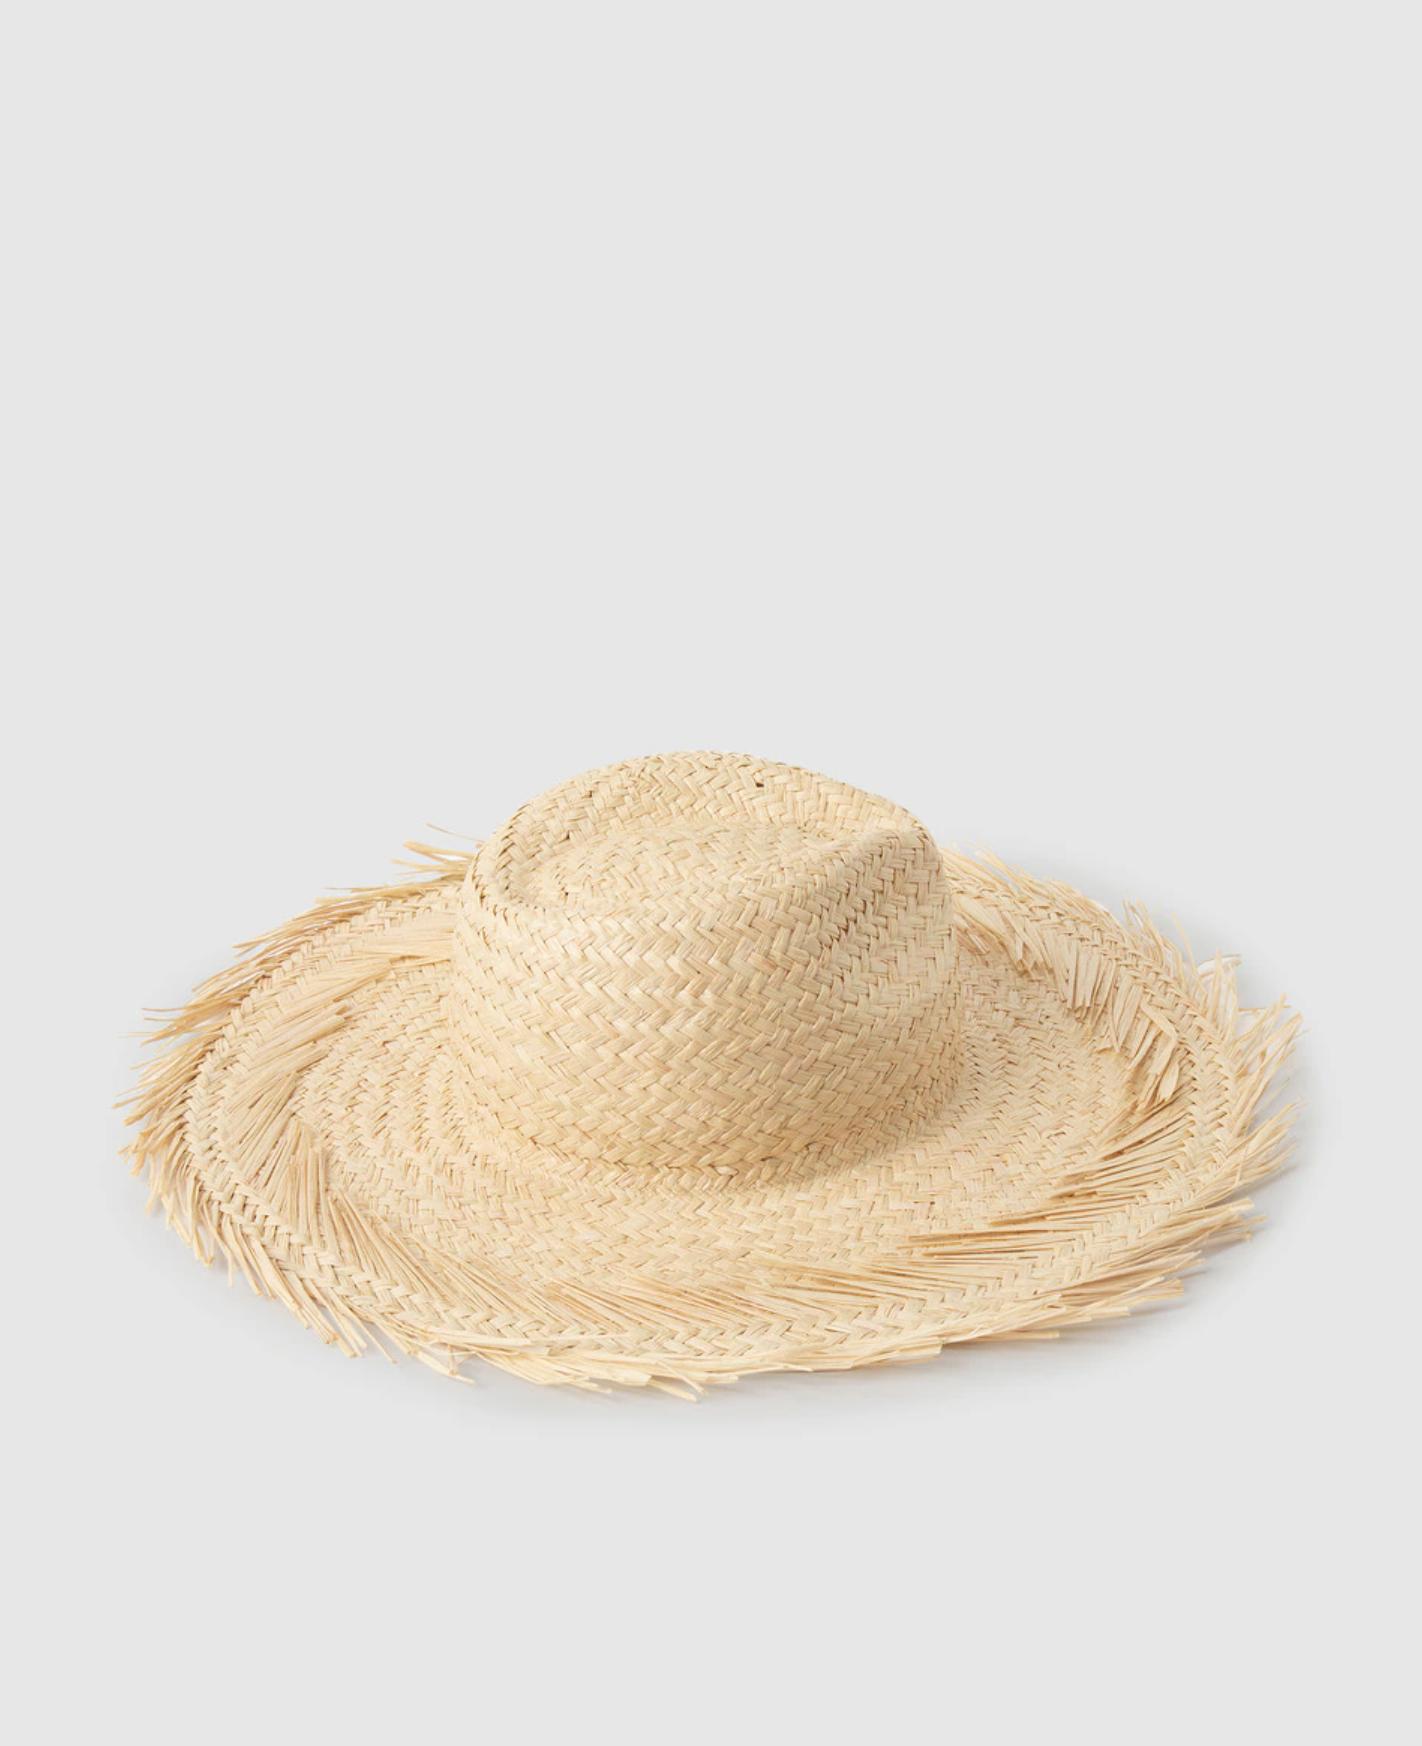 Sombrero de paja de Énfasis